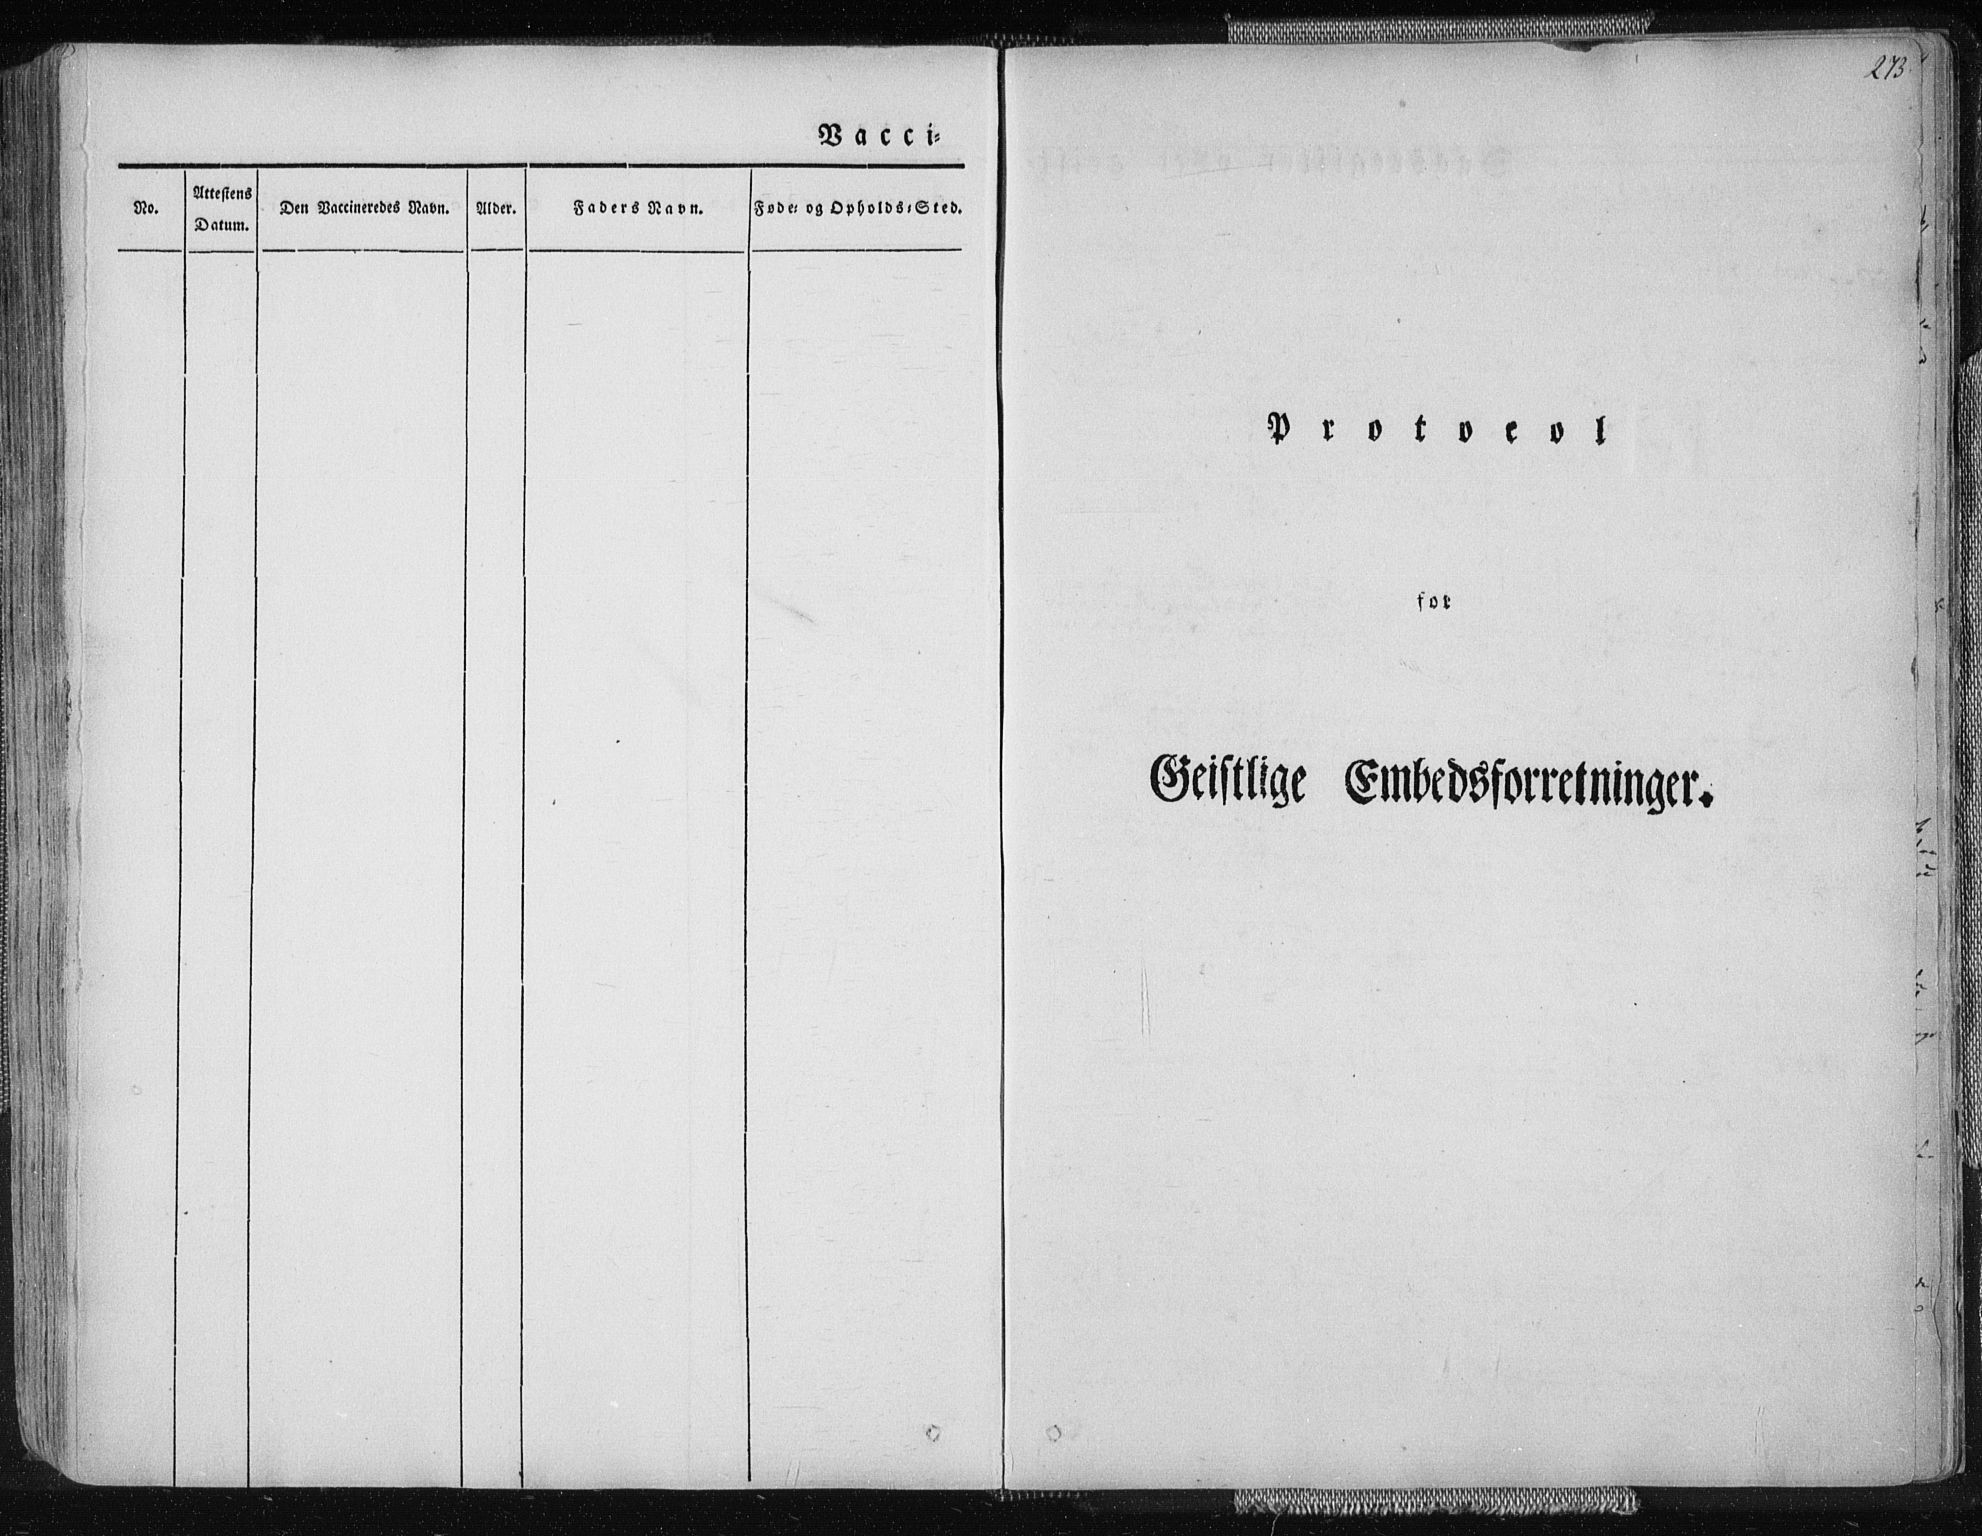 SAT, Ministerialprotokoller, klokkerbøker og fødselsregistre - Nordland, 827/L0390: Ministerialbok nr. 827A02, 1826-1841, s. 273